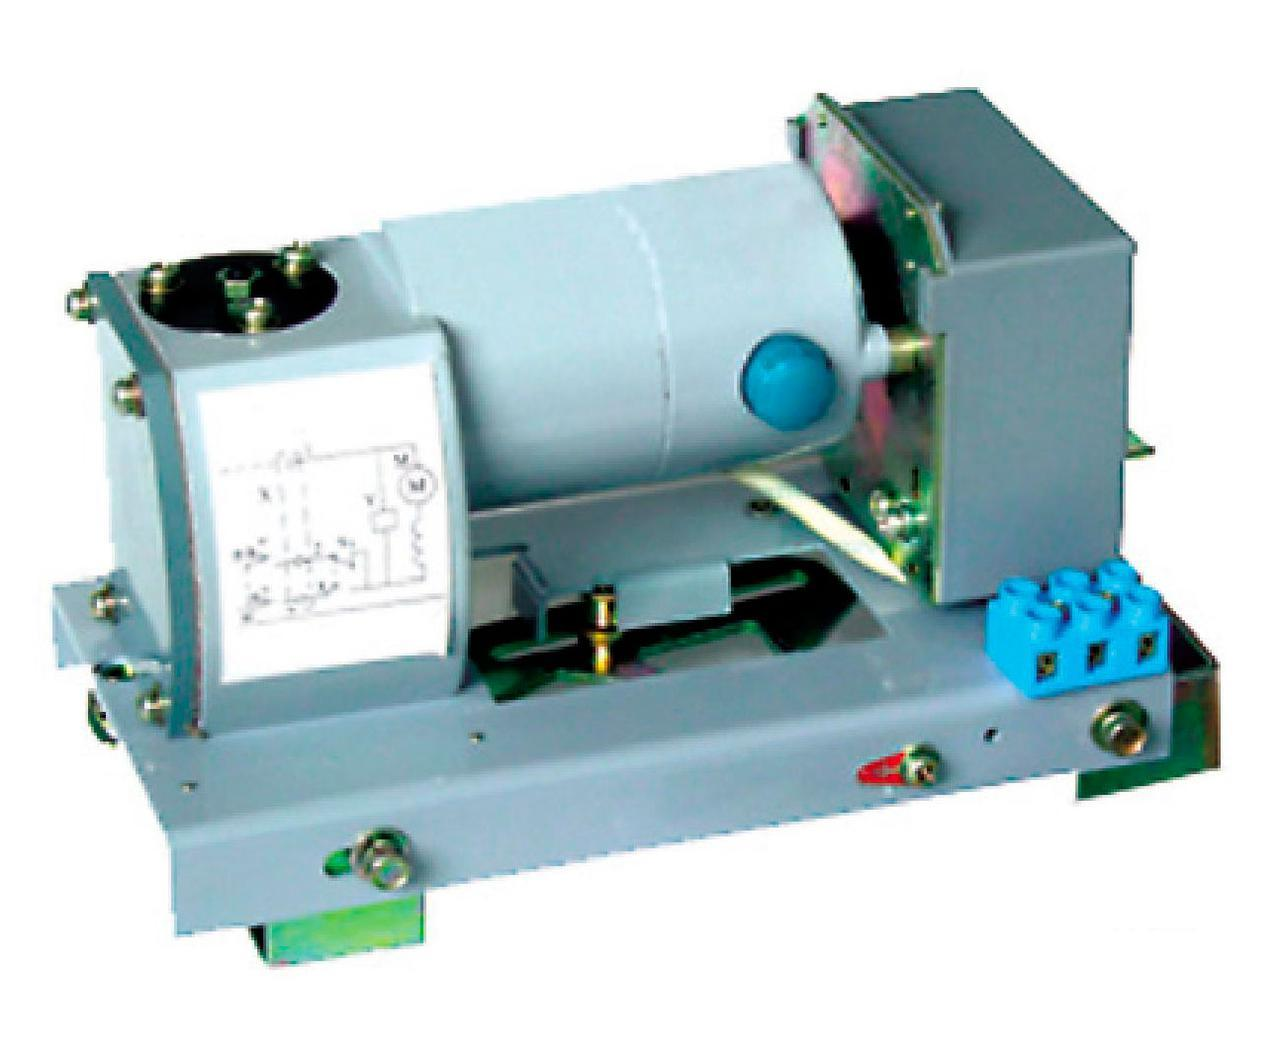 Привод электромеханический 630S (230V) ПЭ 77Л-630